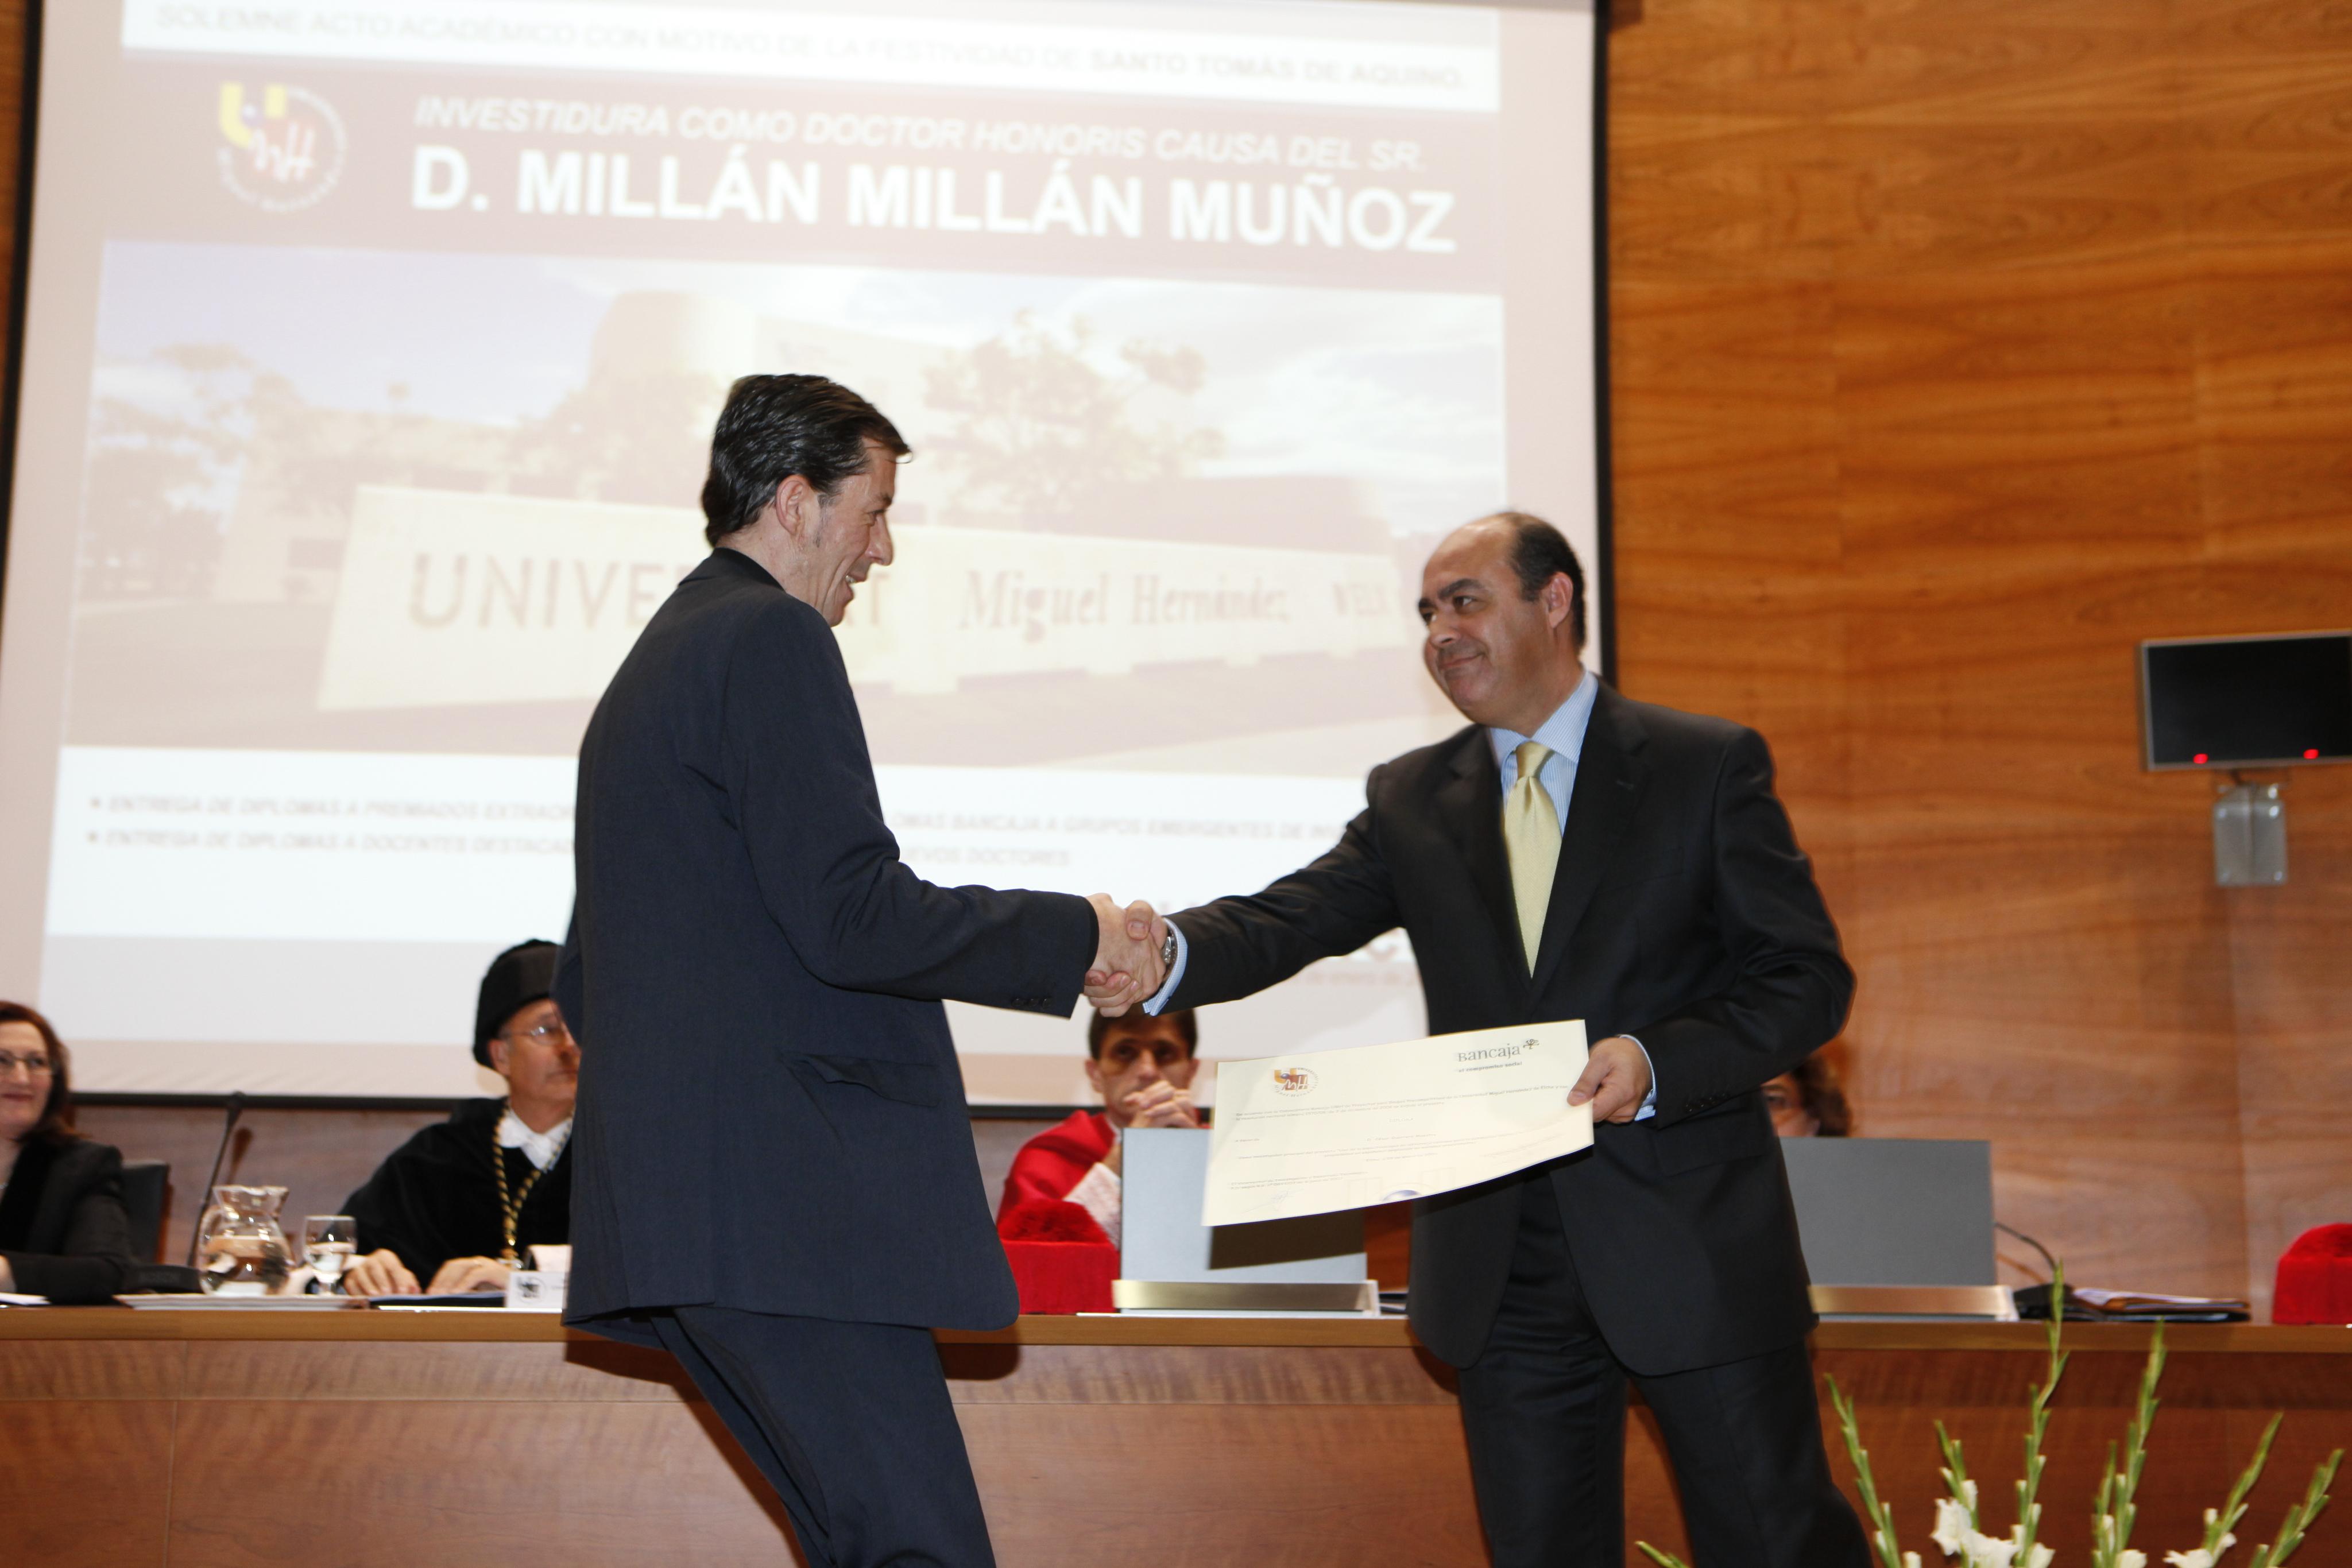 Entrega Diplomas_mg_5237.jpg